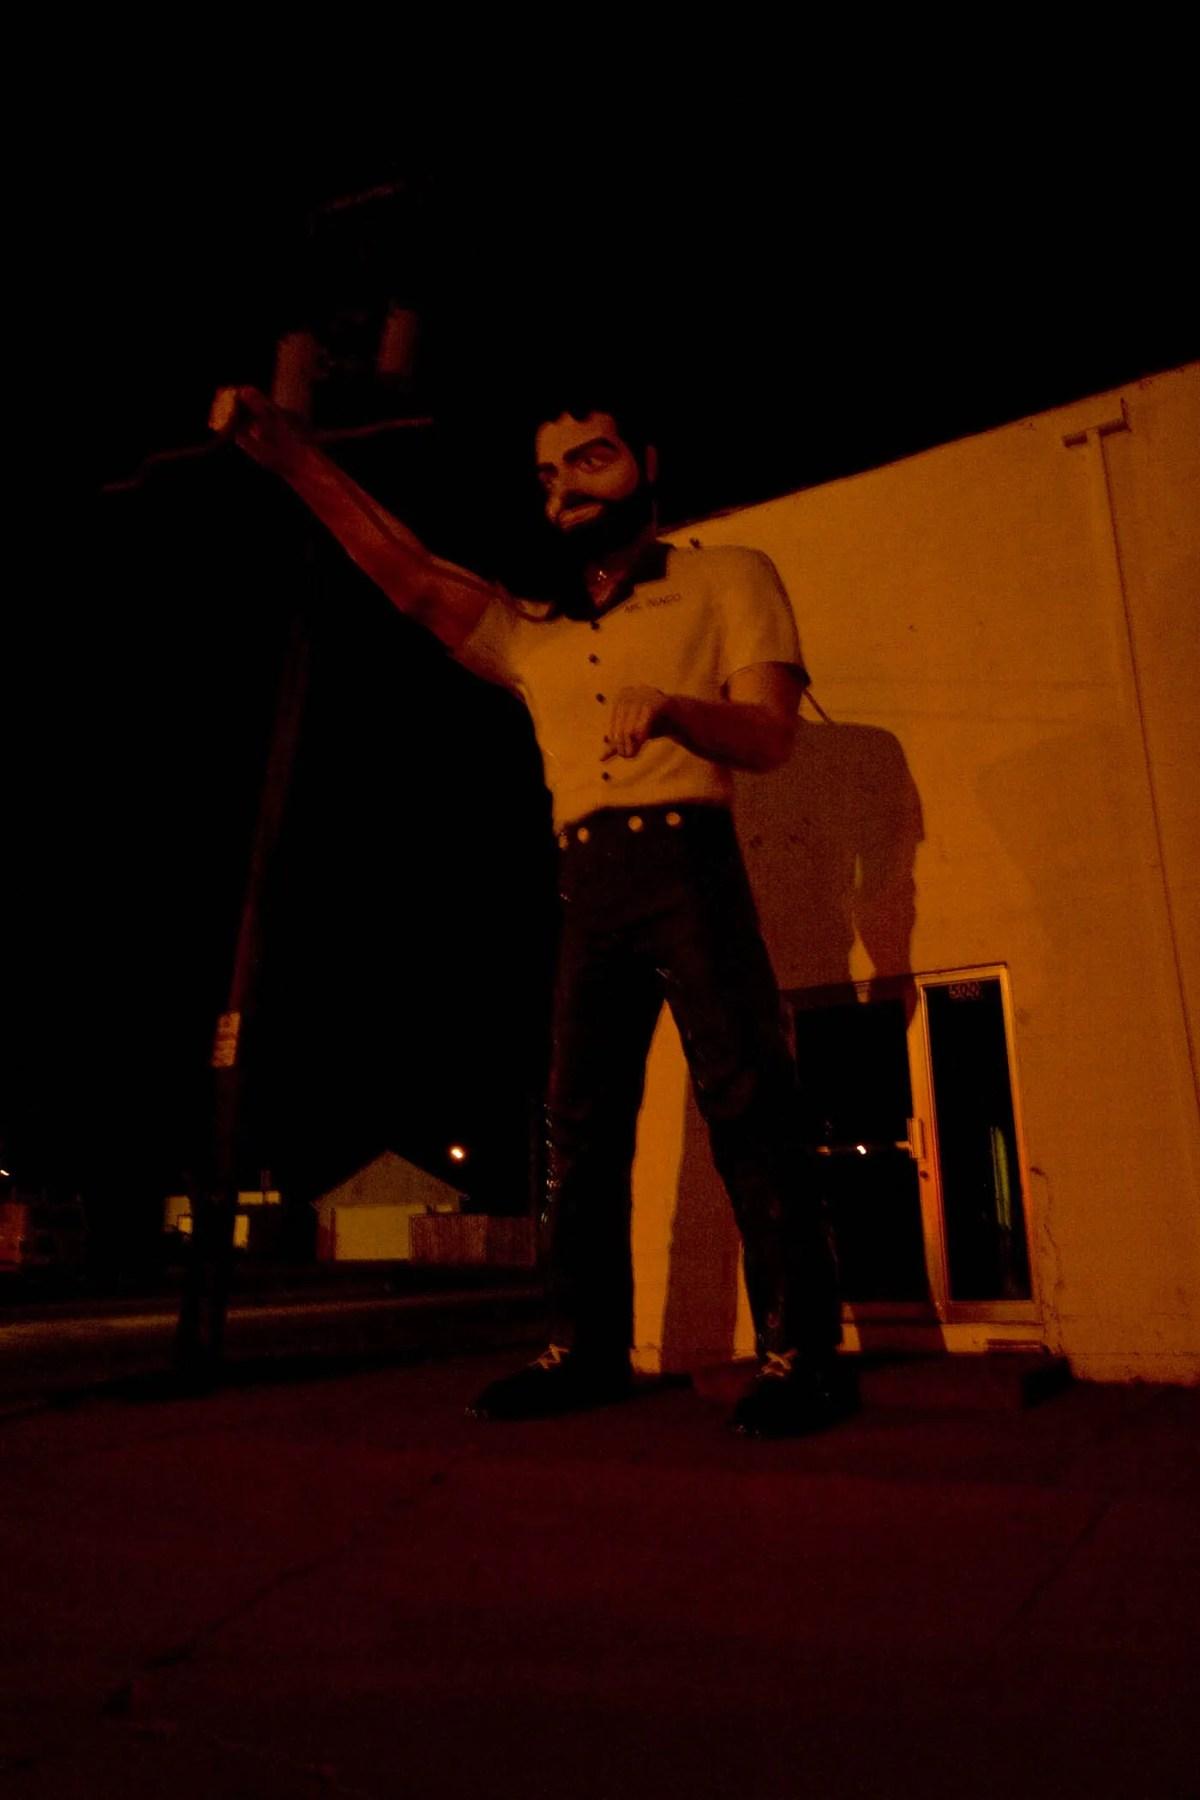 Sioux Falls Mr. Bendo Muffler Man in South Dakota